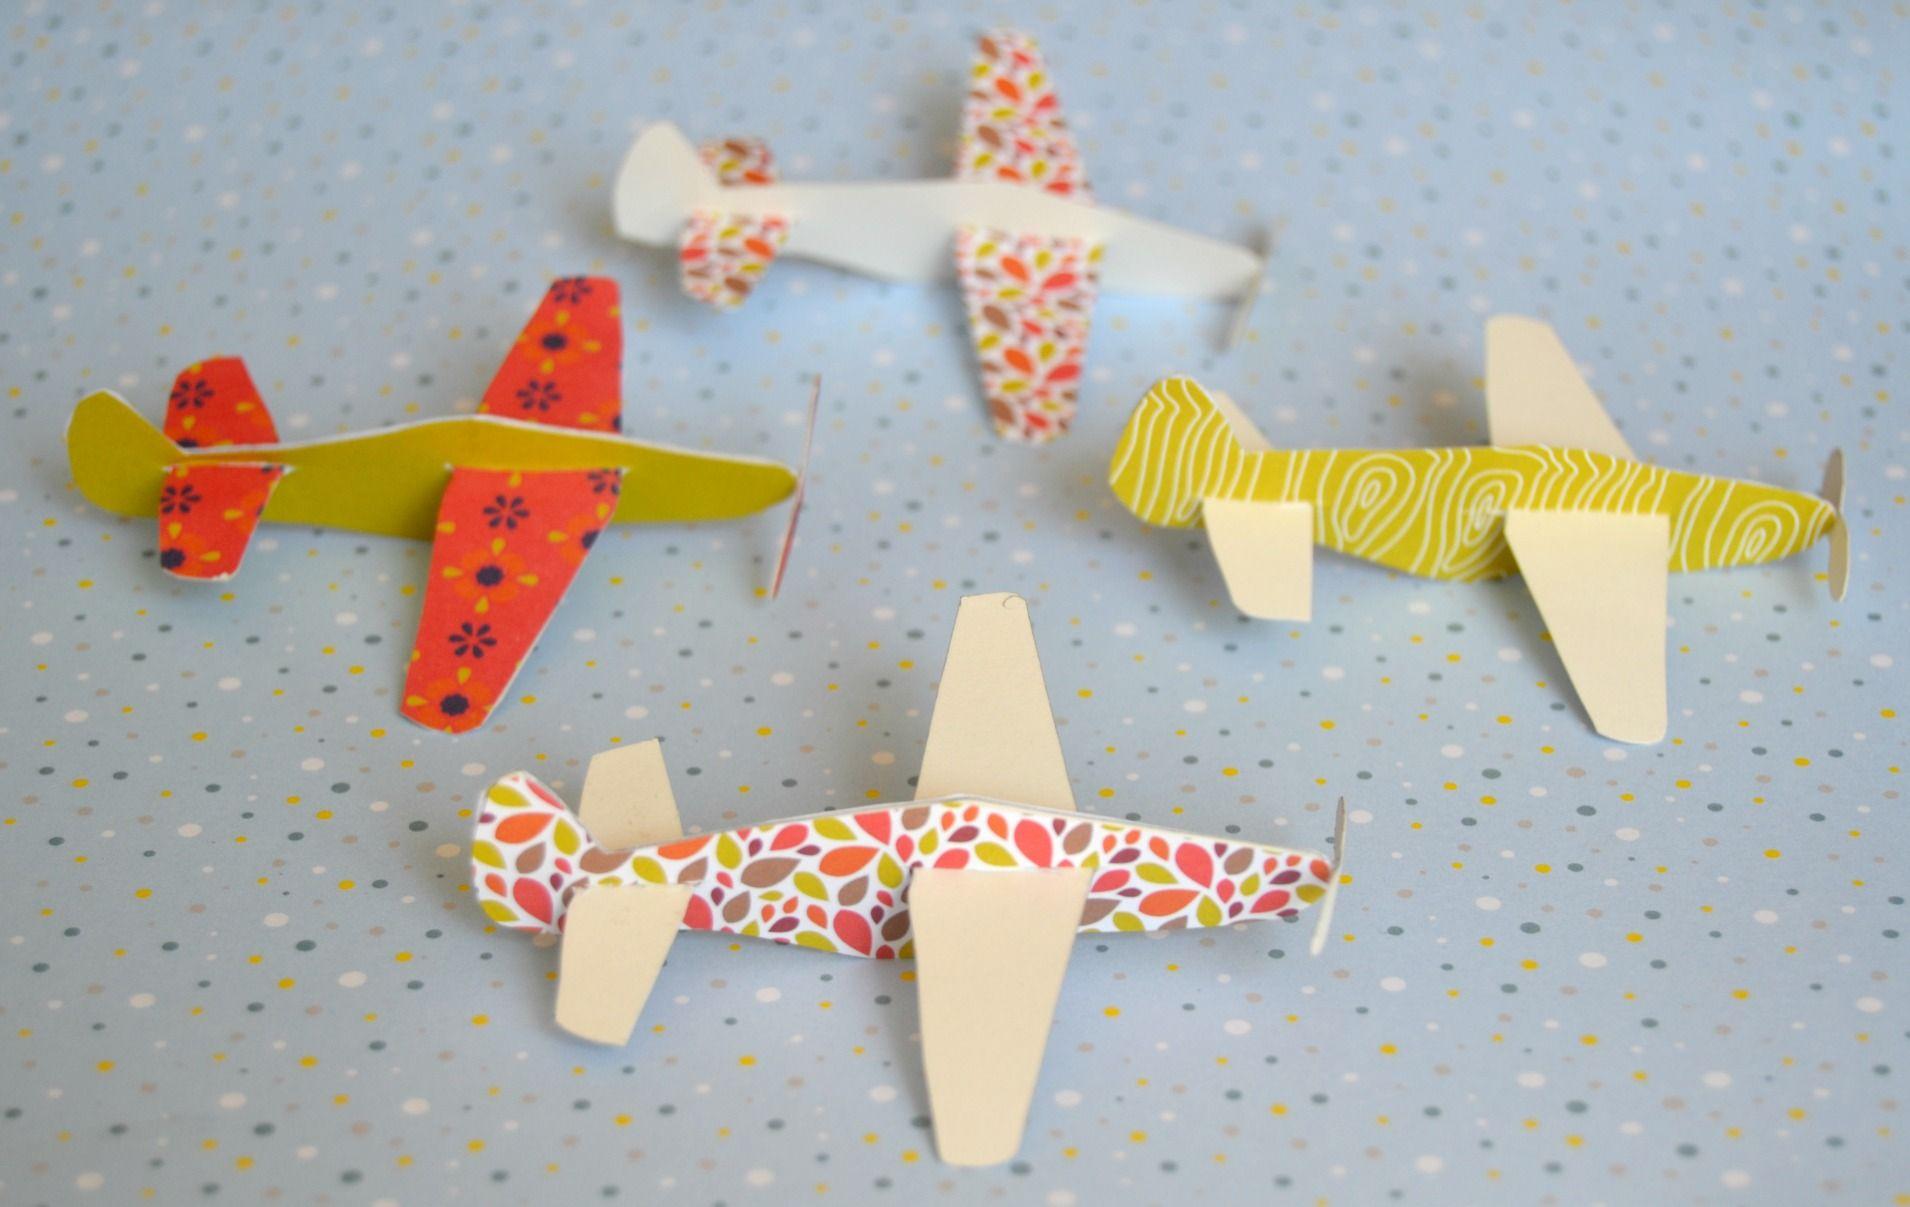 diy les avions en papier mobile diy d co bricolage id es astuces pinterest avion. Black Bedroom Furniture Sets. Home Design Ideas